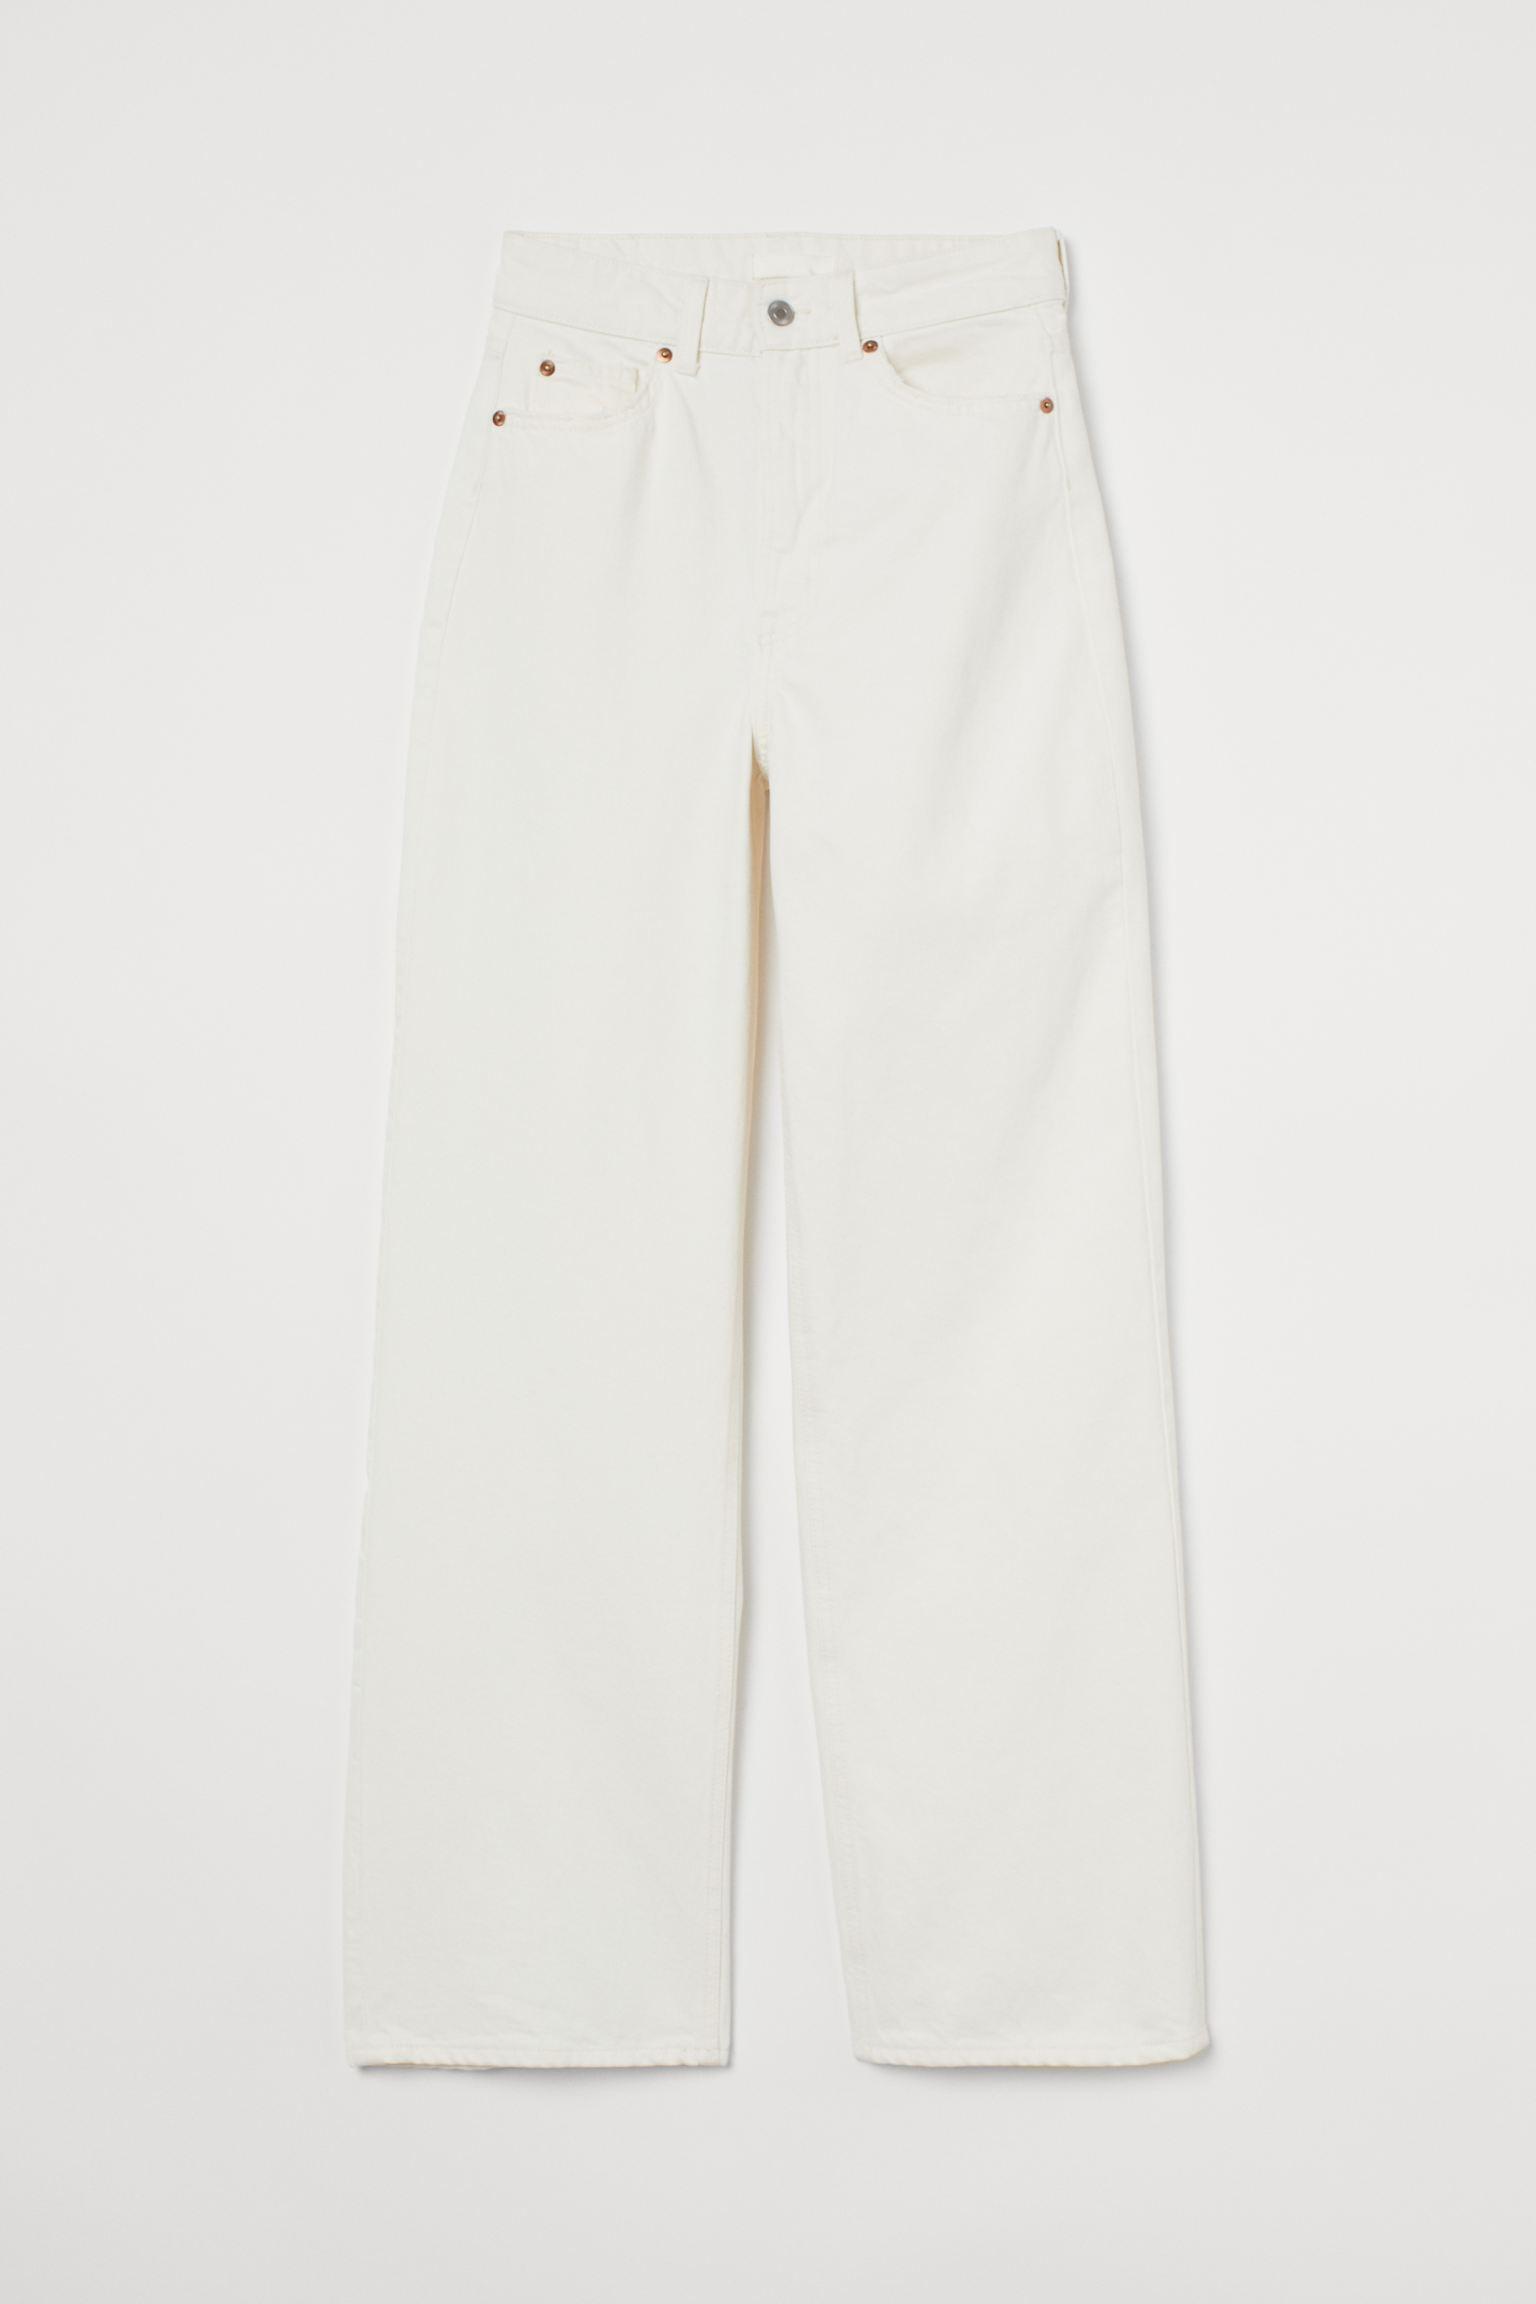 White high rise jeans